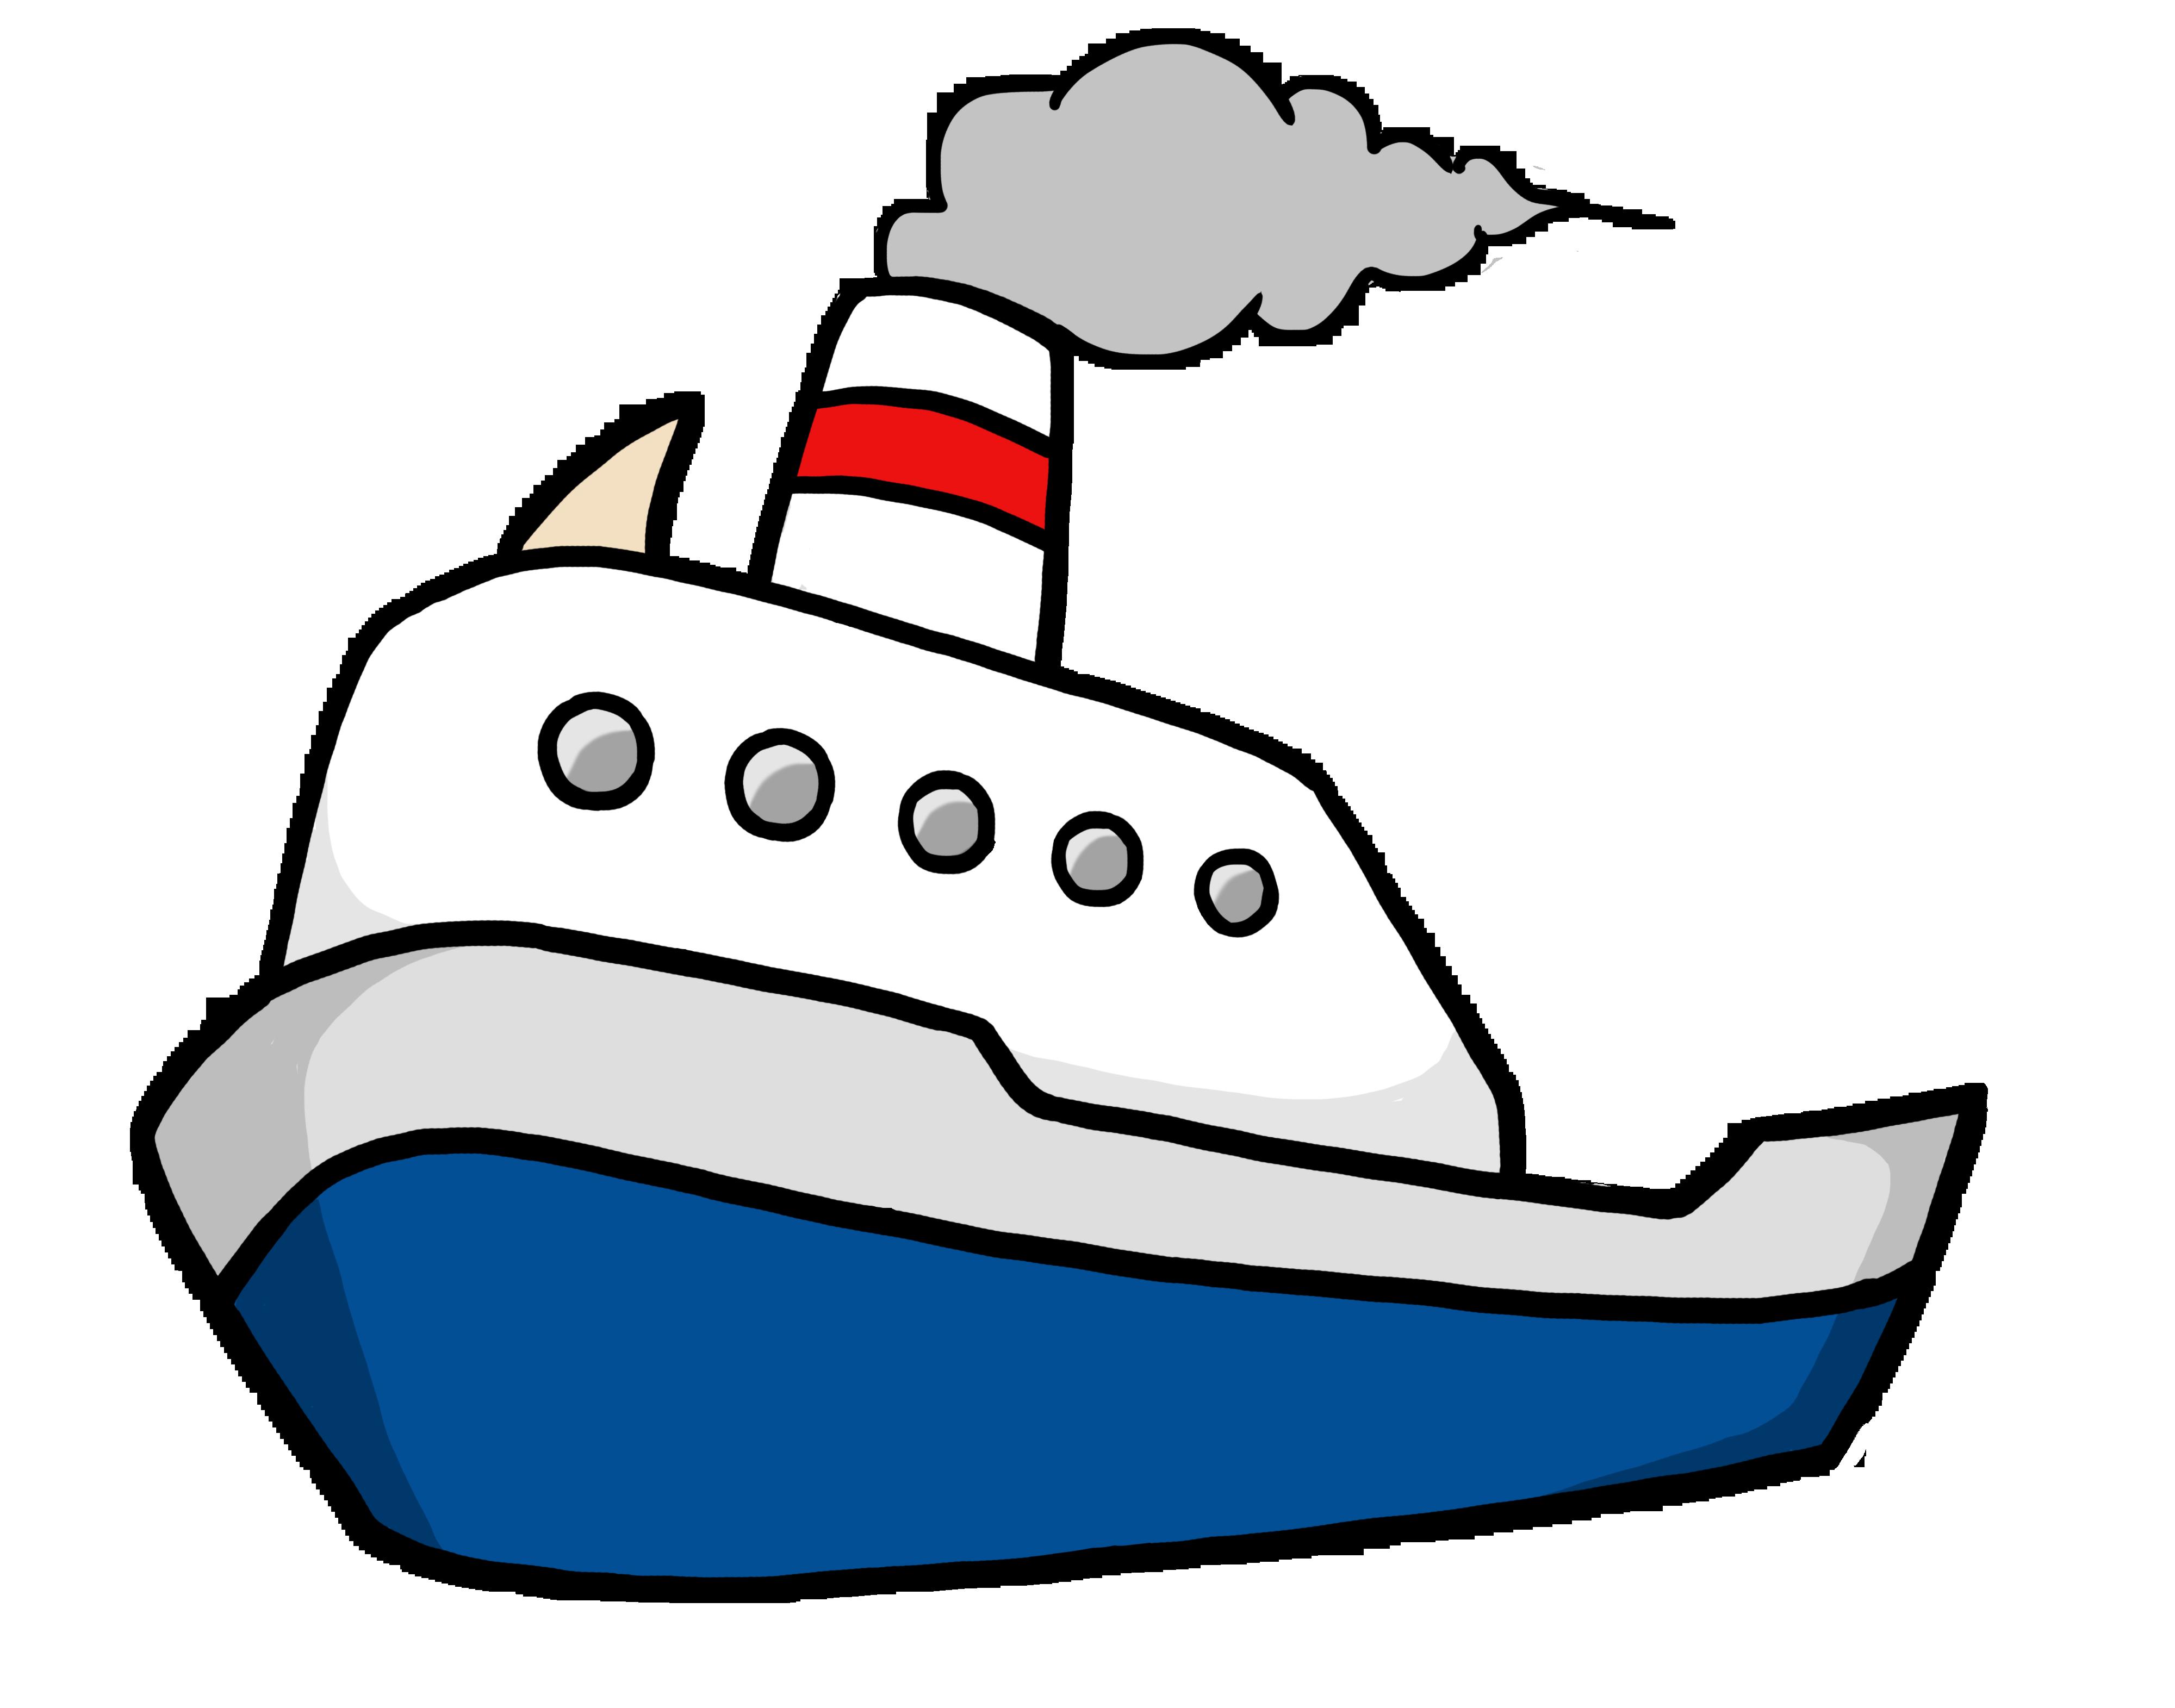 4000x3142 Boat Images Clip Art